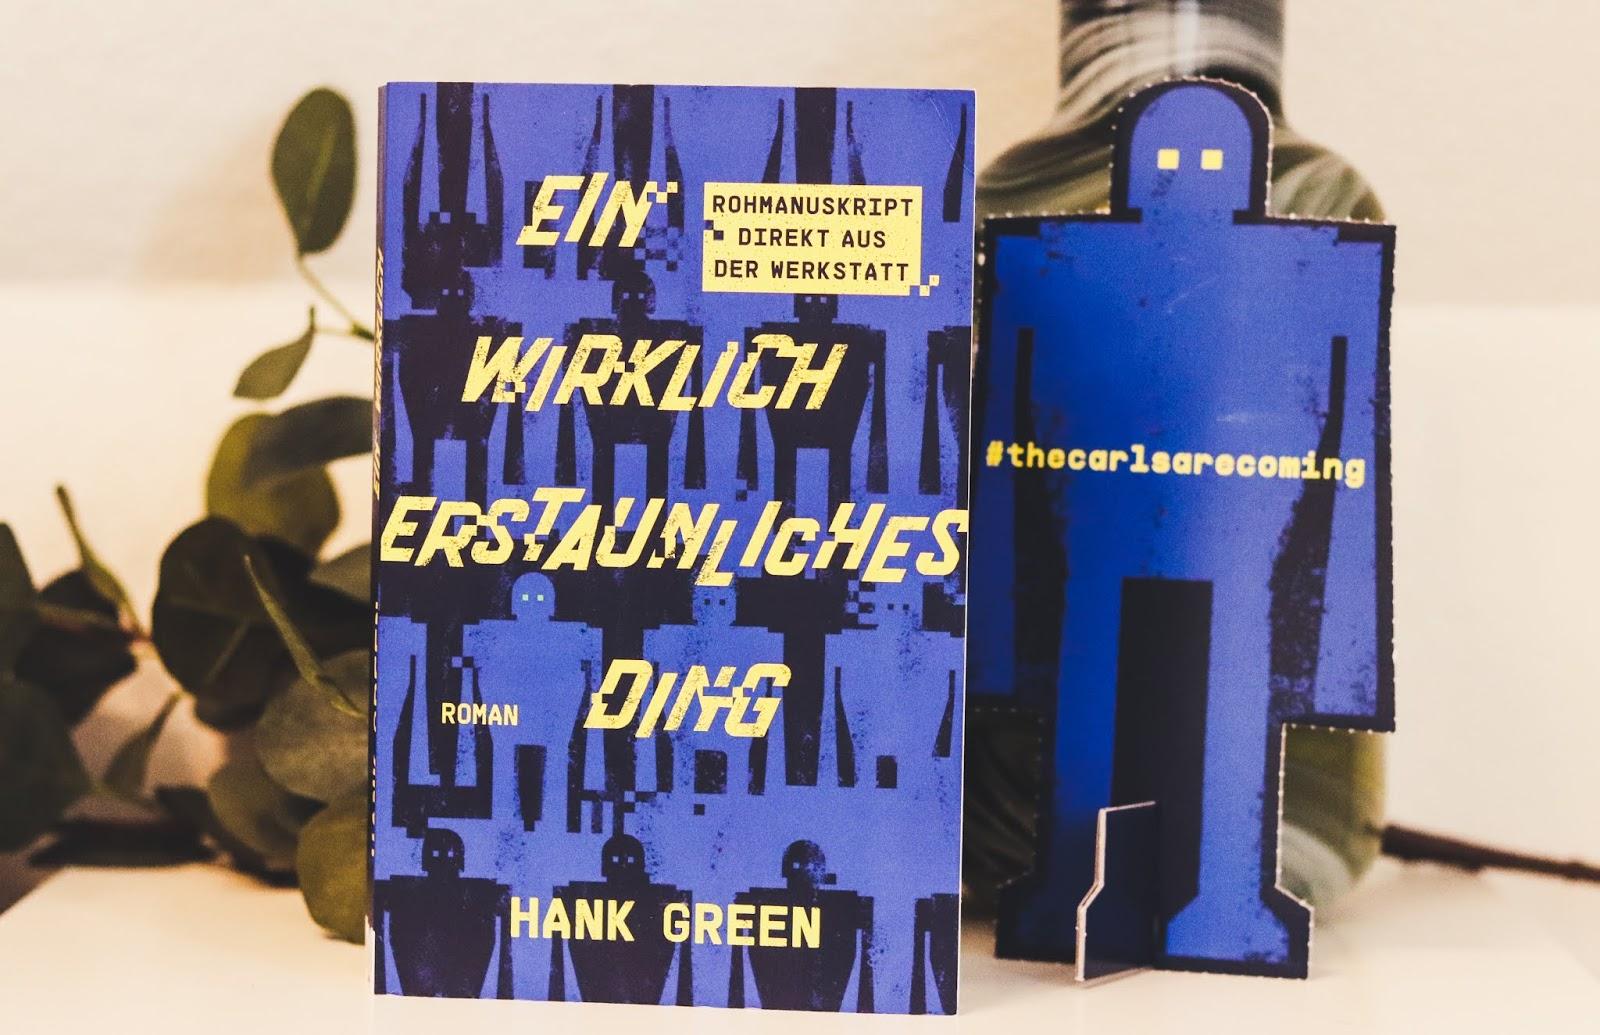 Rezension, Literatur, dtv-verlag, MissPaperback, Zukunftsroman, Hank Green